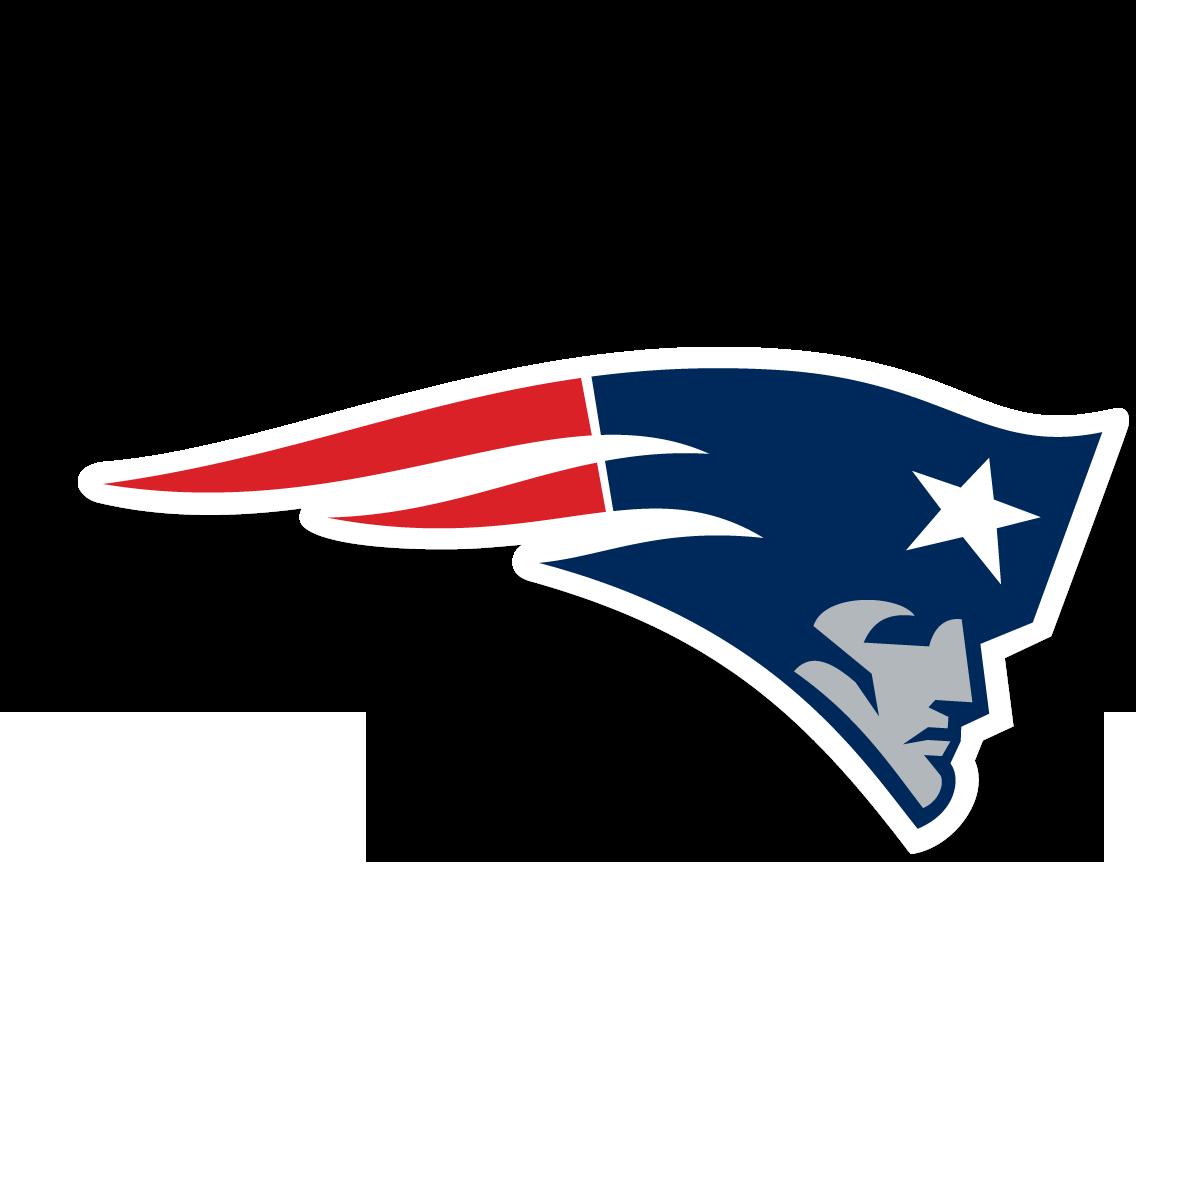 NFL New England Patriots   FantasyAlarm.com